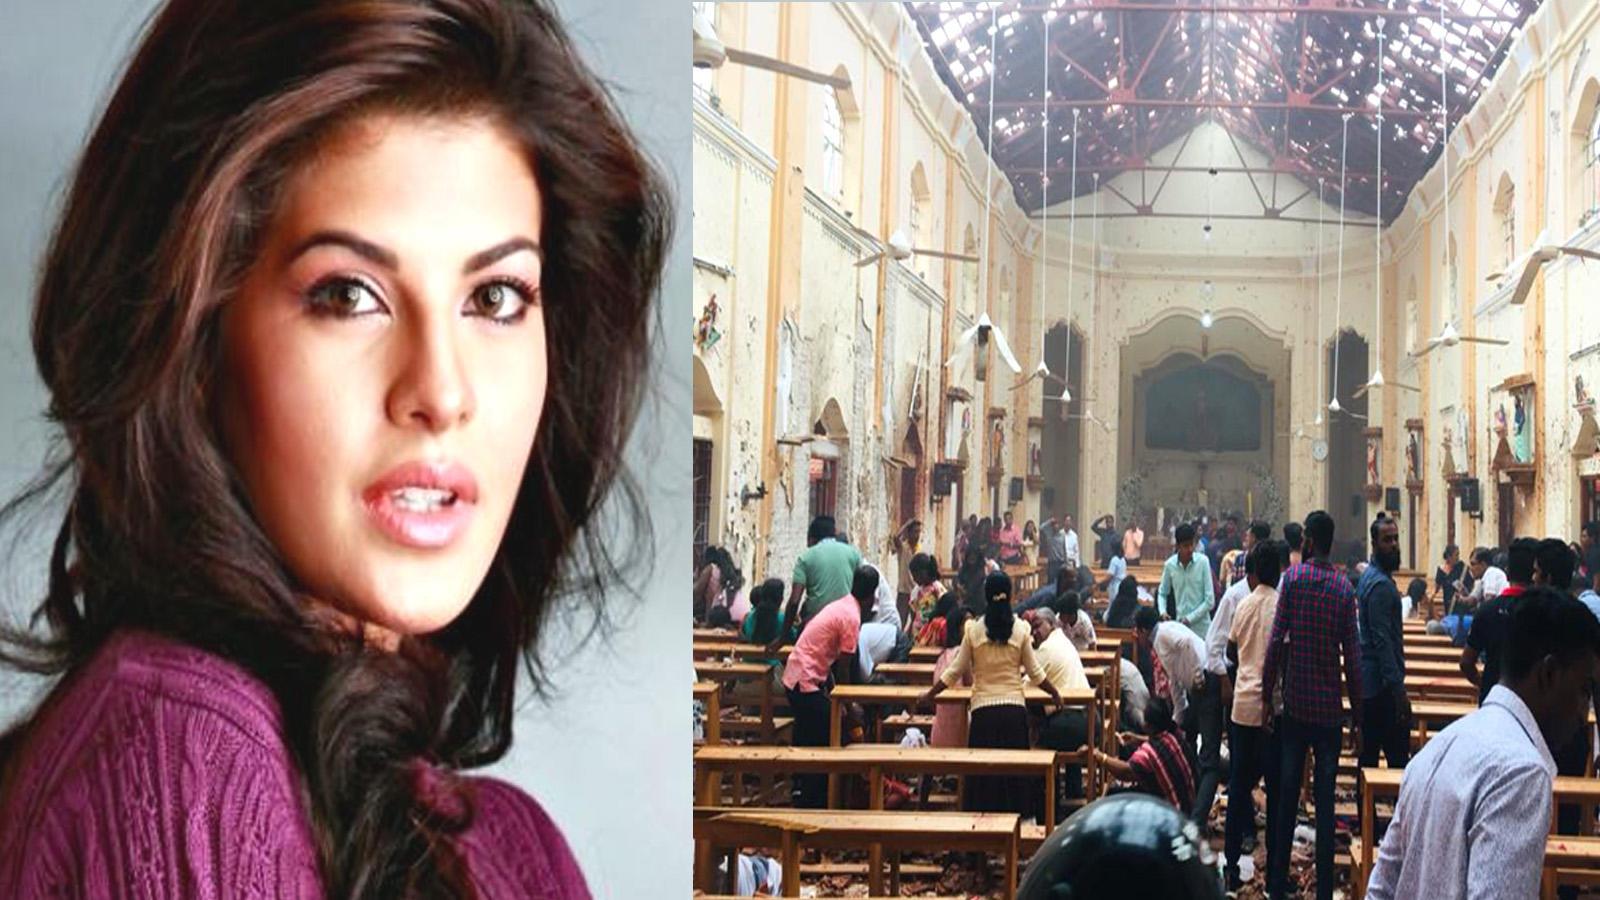 jacqueline-fernandez-to-swara-bhasker-bollywood-celebs-condemn-blasts-in-sri-lanka